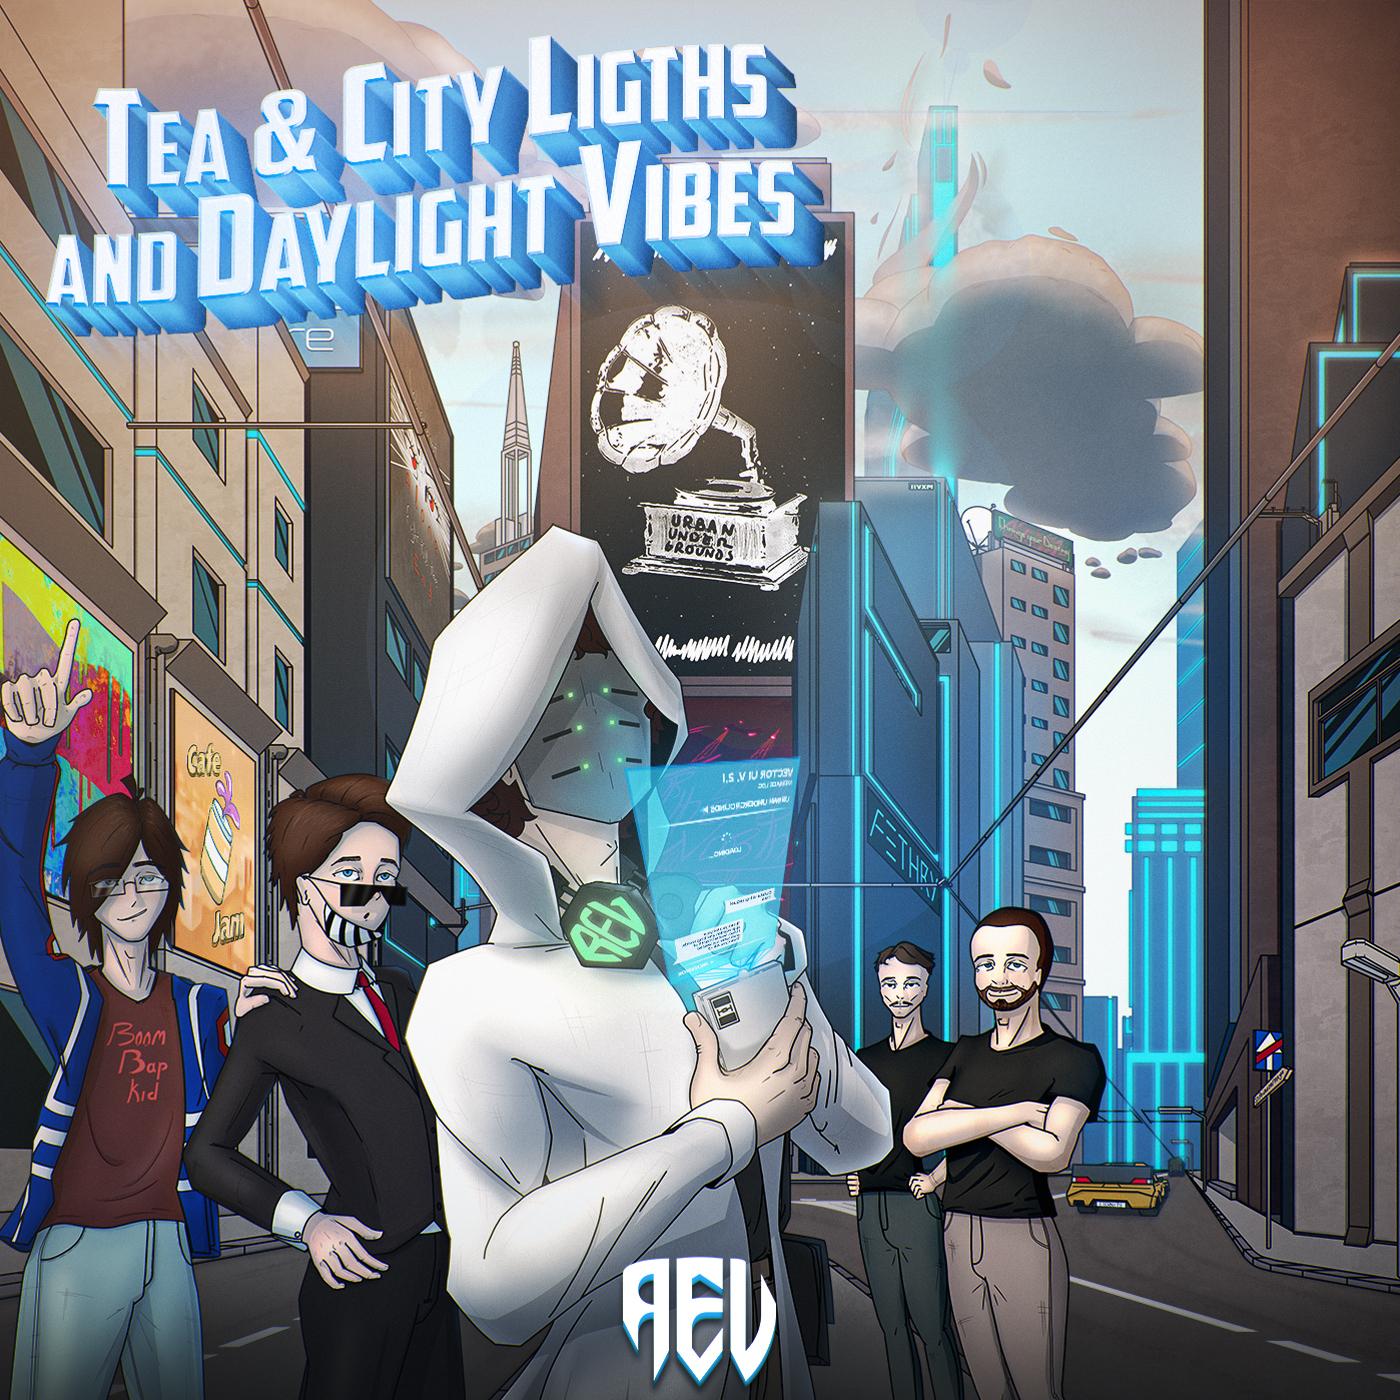 Tea & City Lights and Daylight Vibes